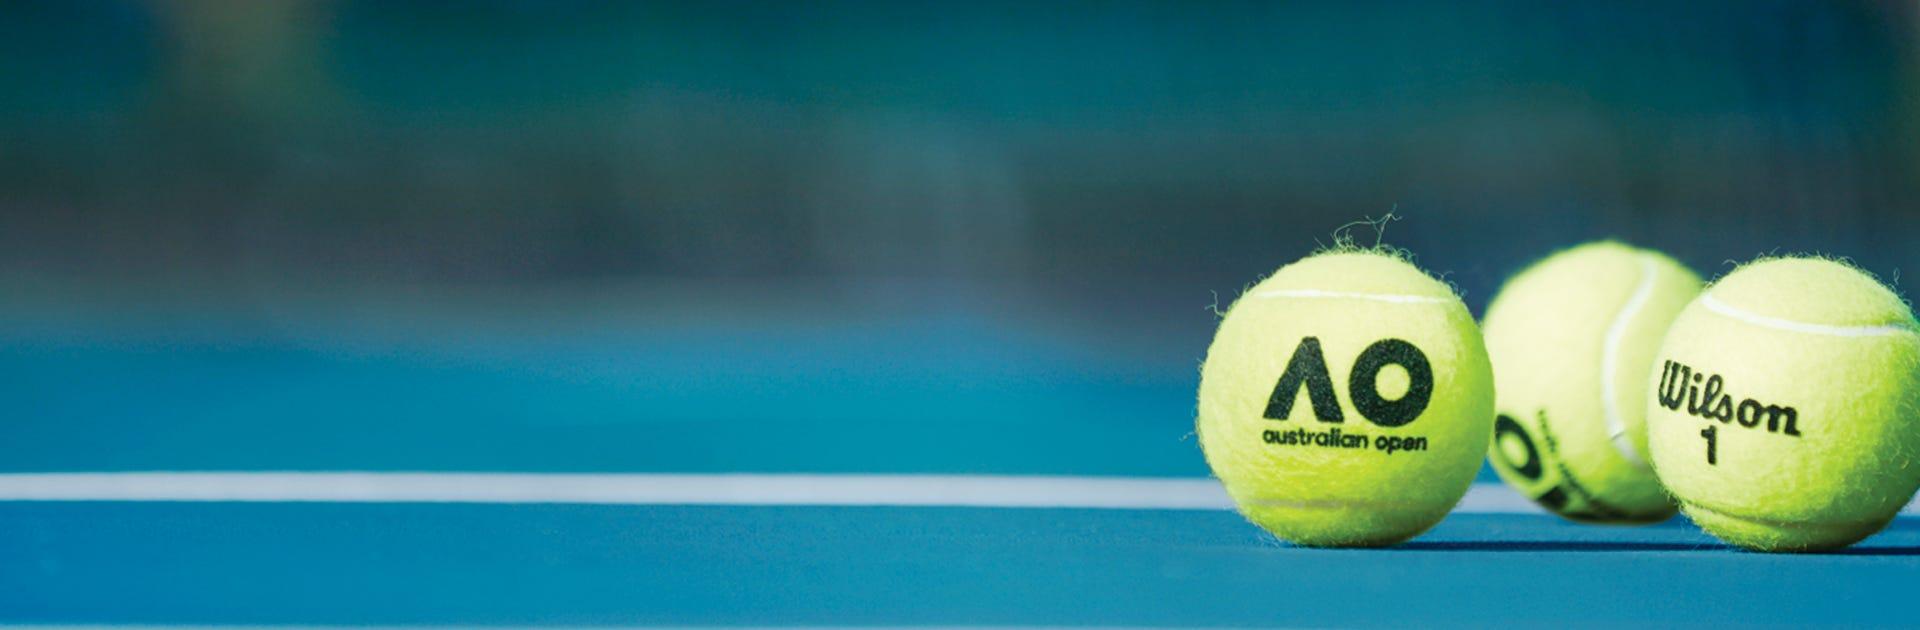 Wilson - Australian Open